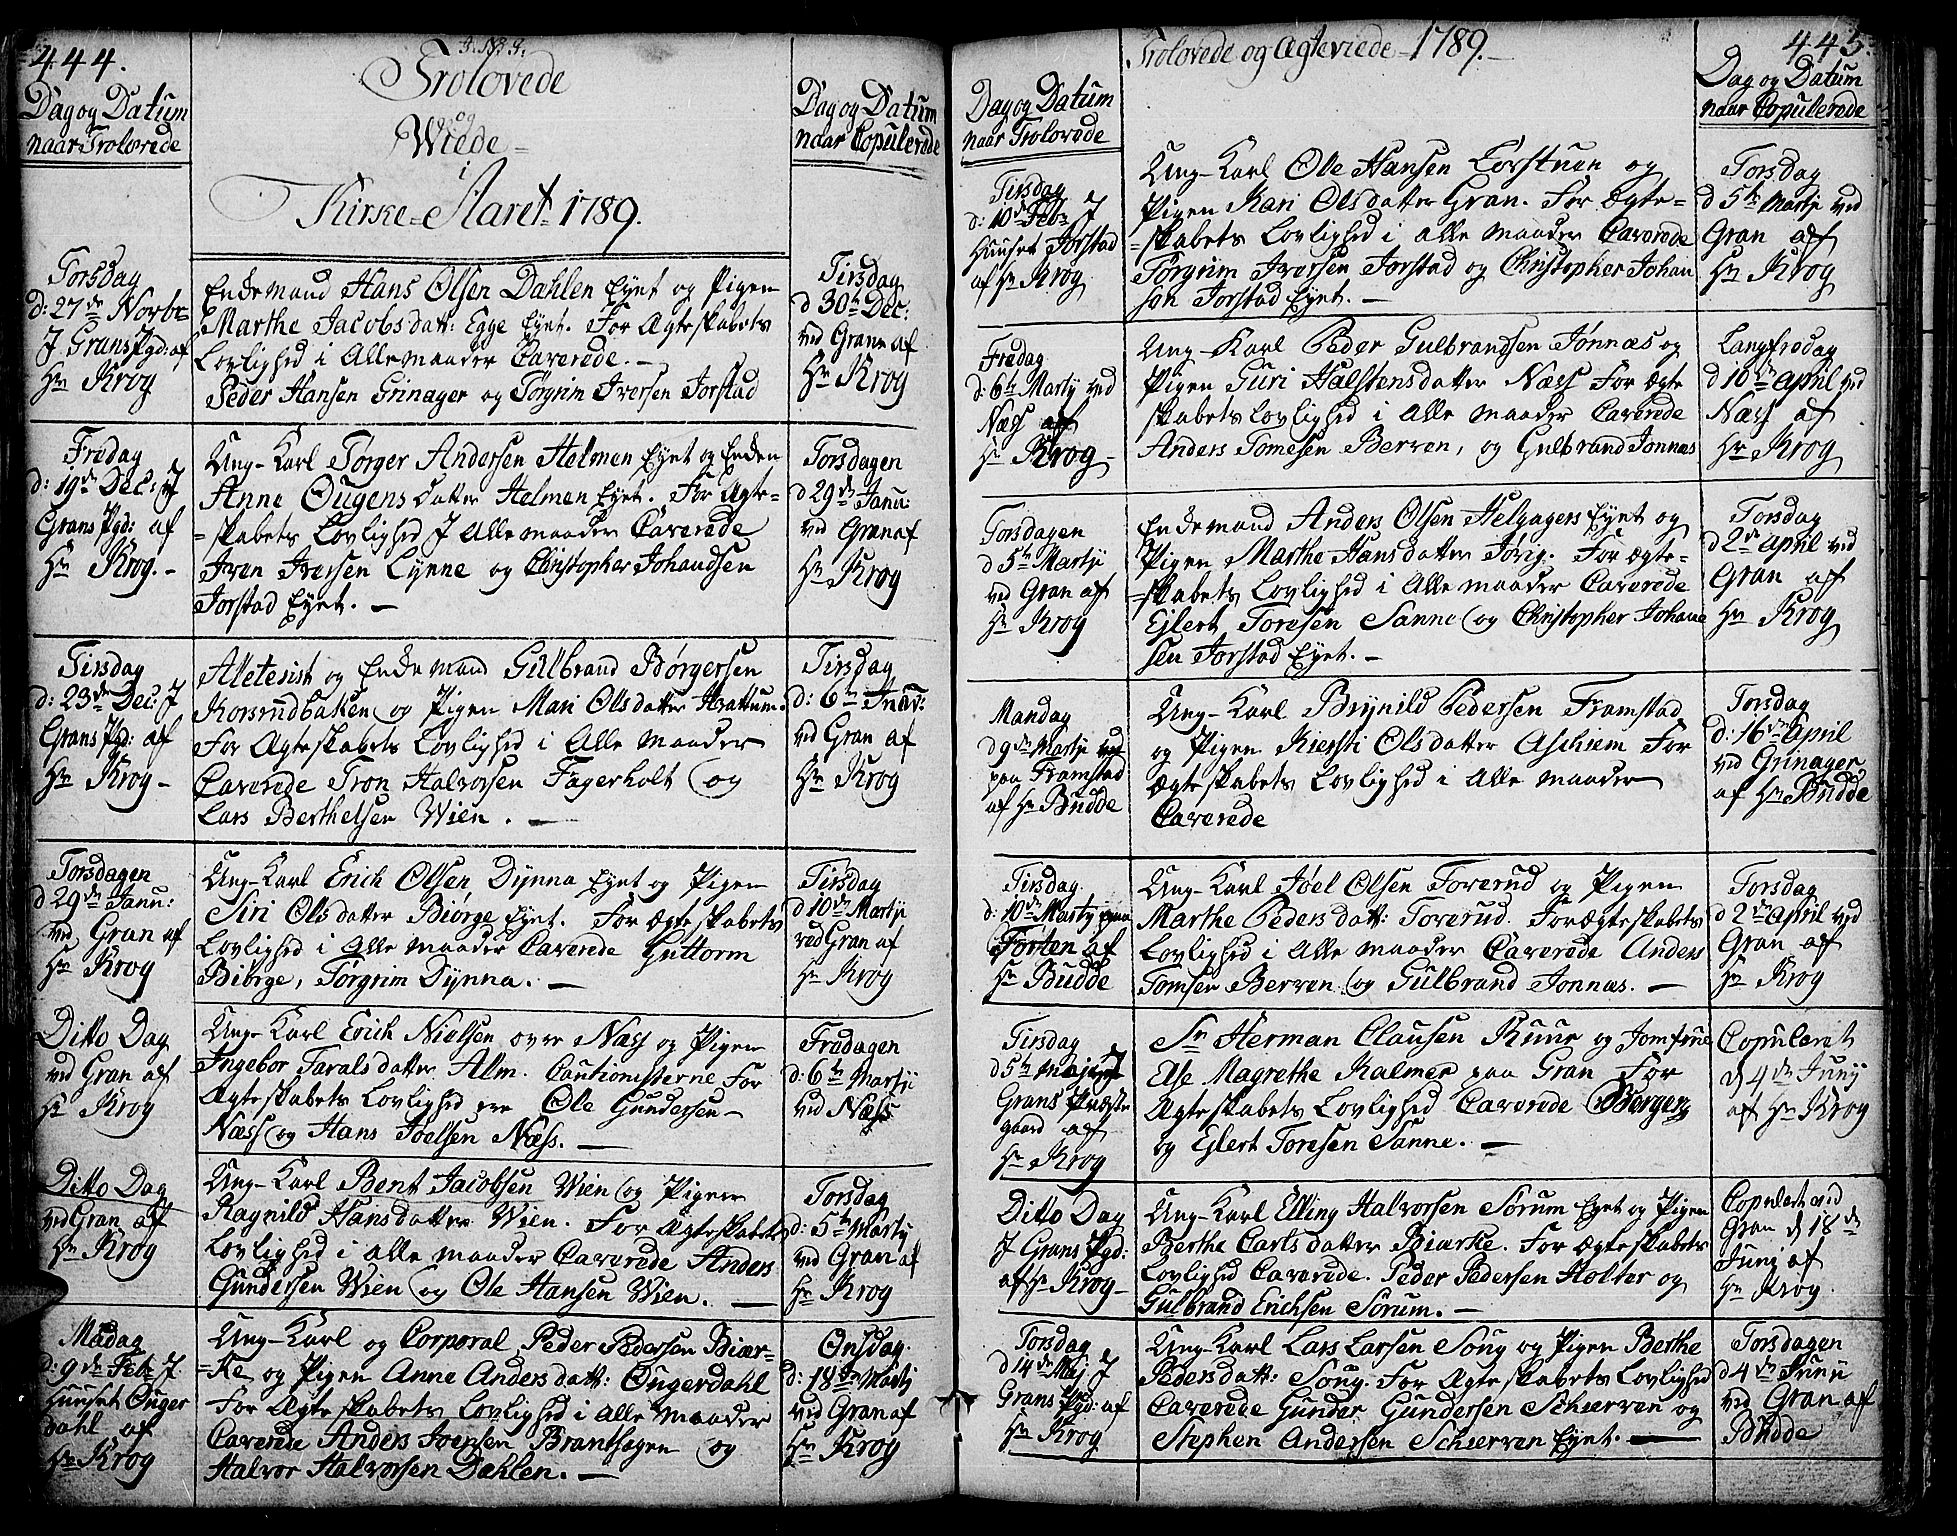 SAH, Gran prestekontor, Ministerialbok nr. 6, 1787-1824, s. 444-445